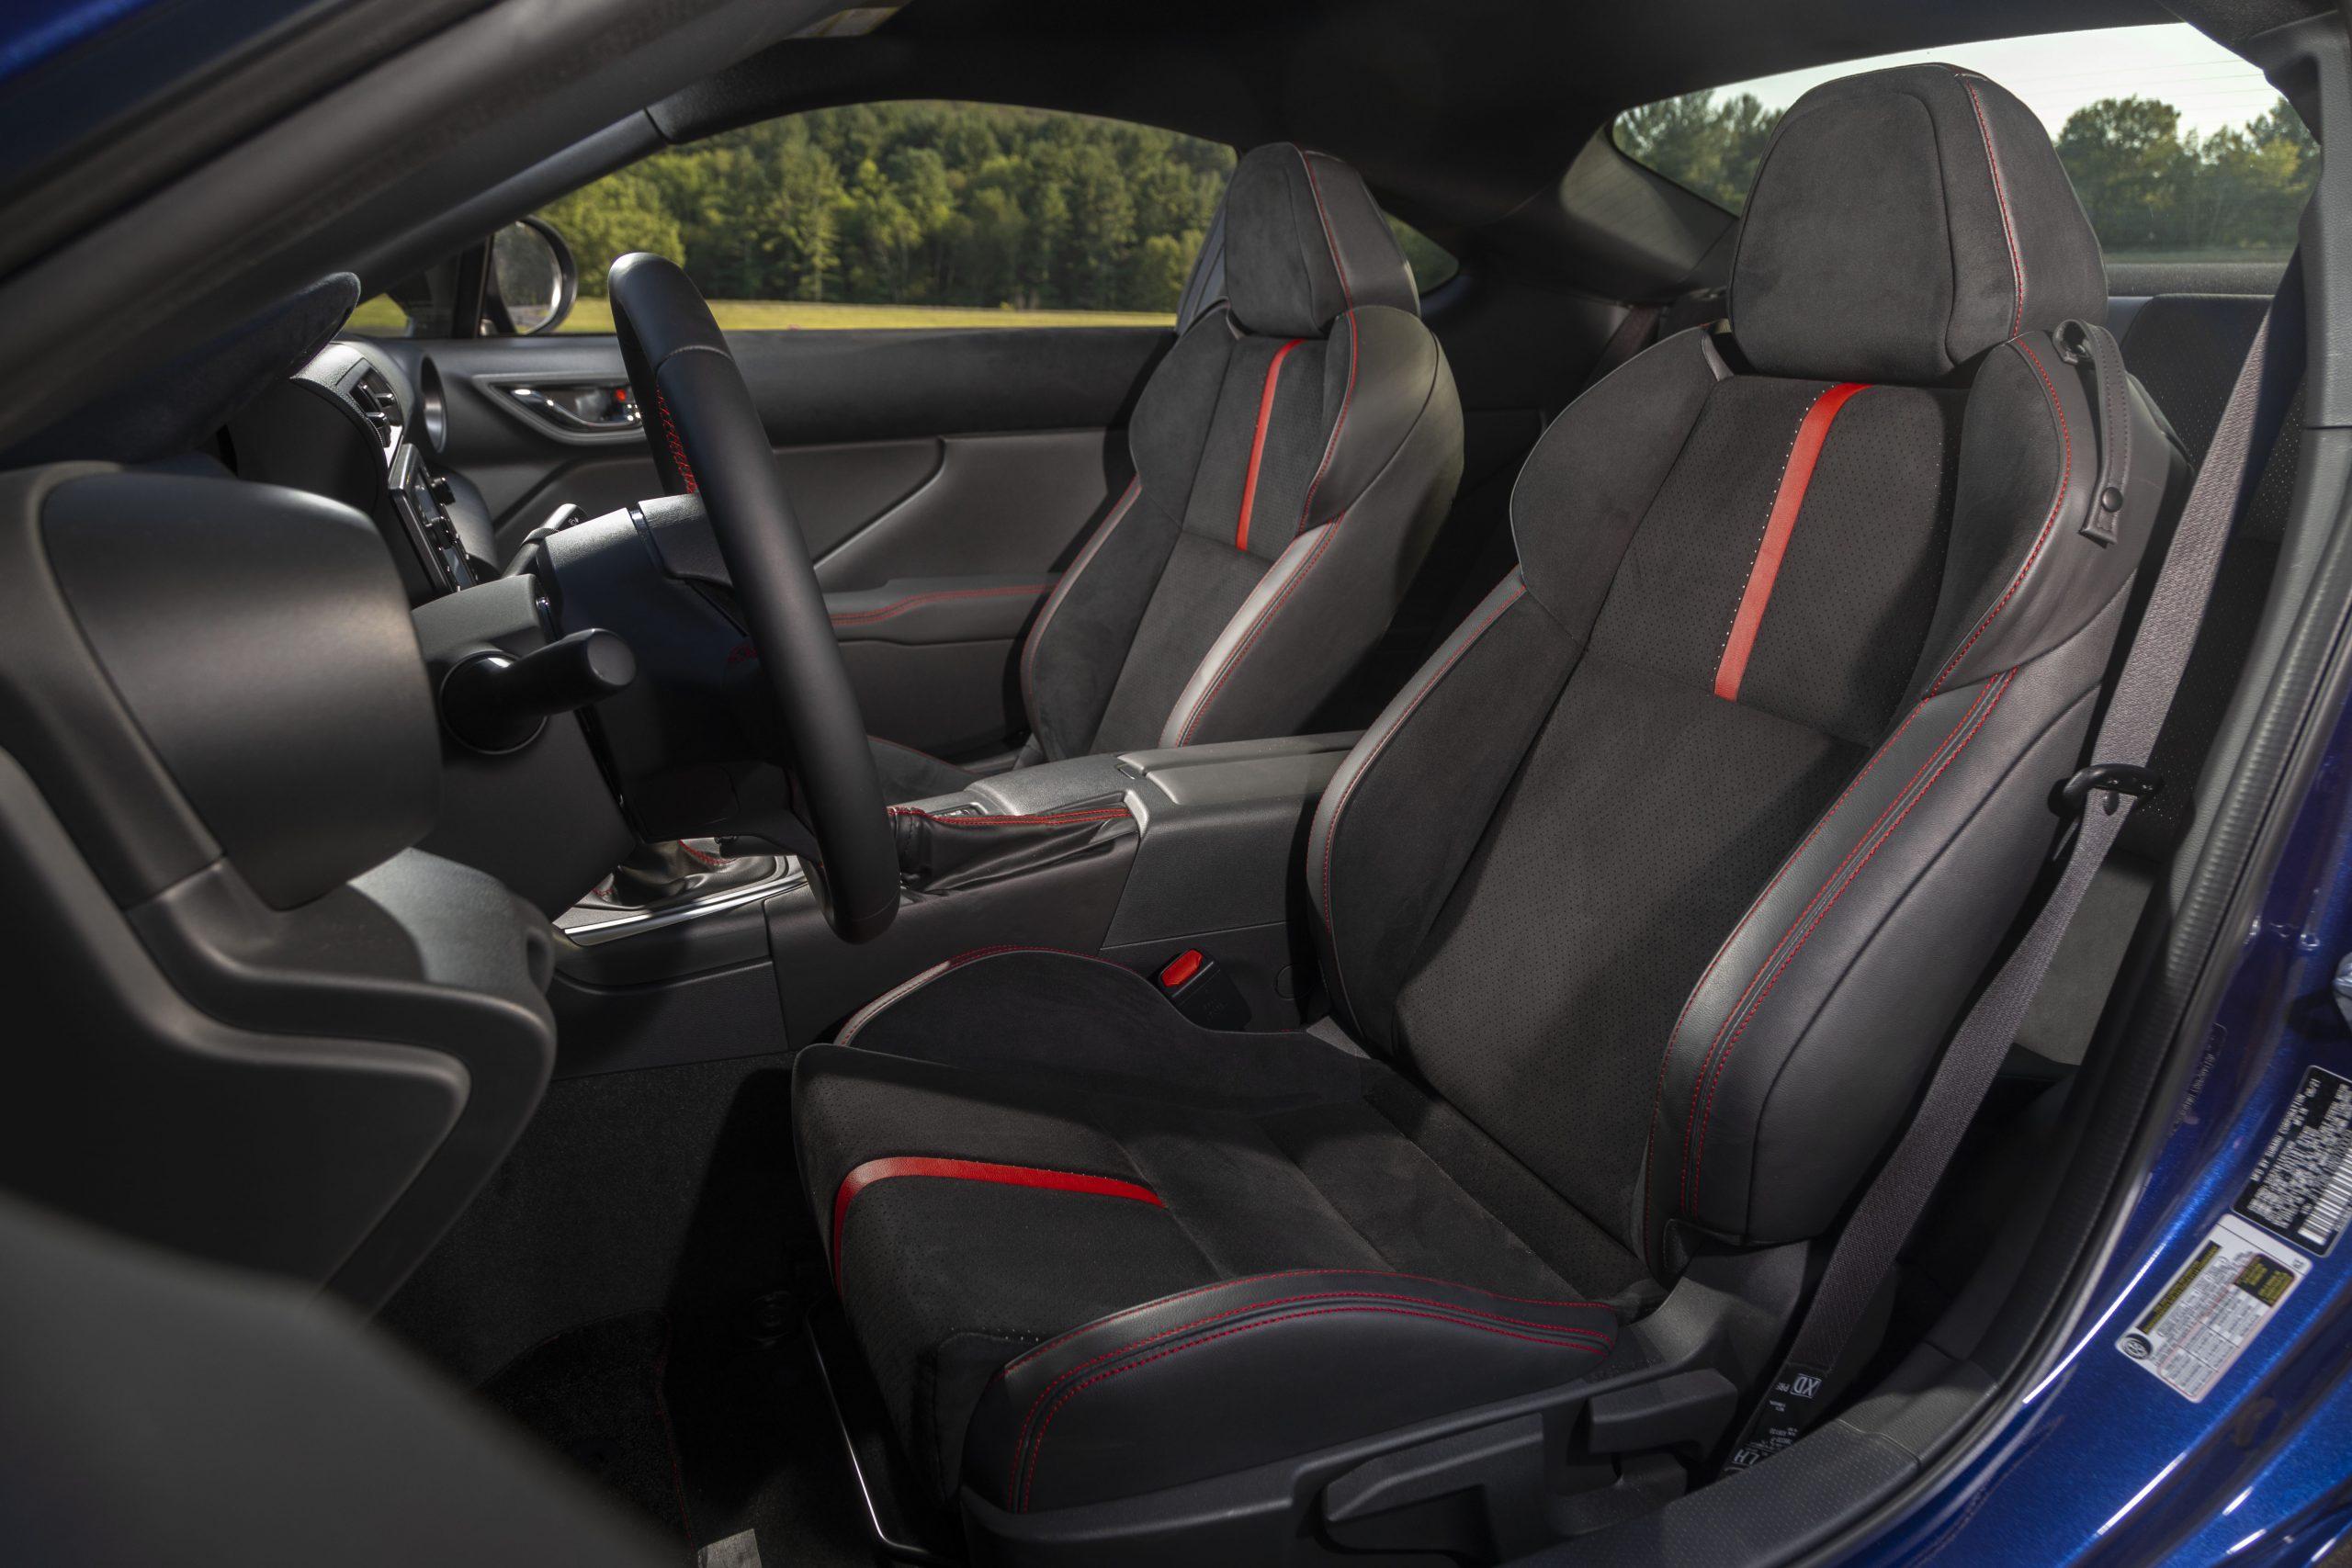 2022 Subaru BRZ interior front seats